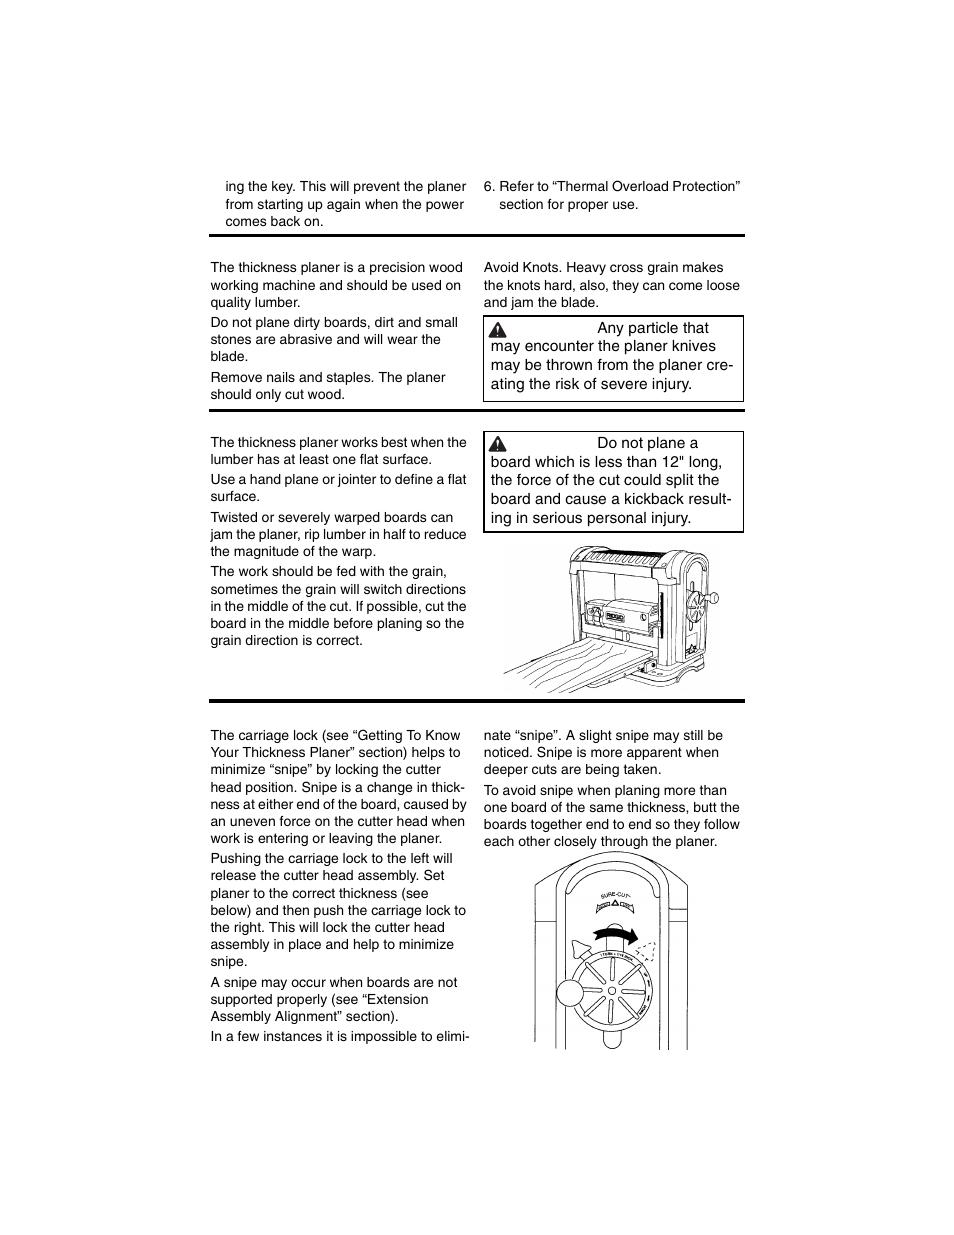 reduce damage to knives preparing the work carriage lock ridgid rh manualsdir com